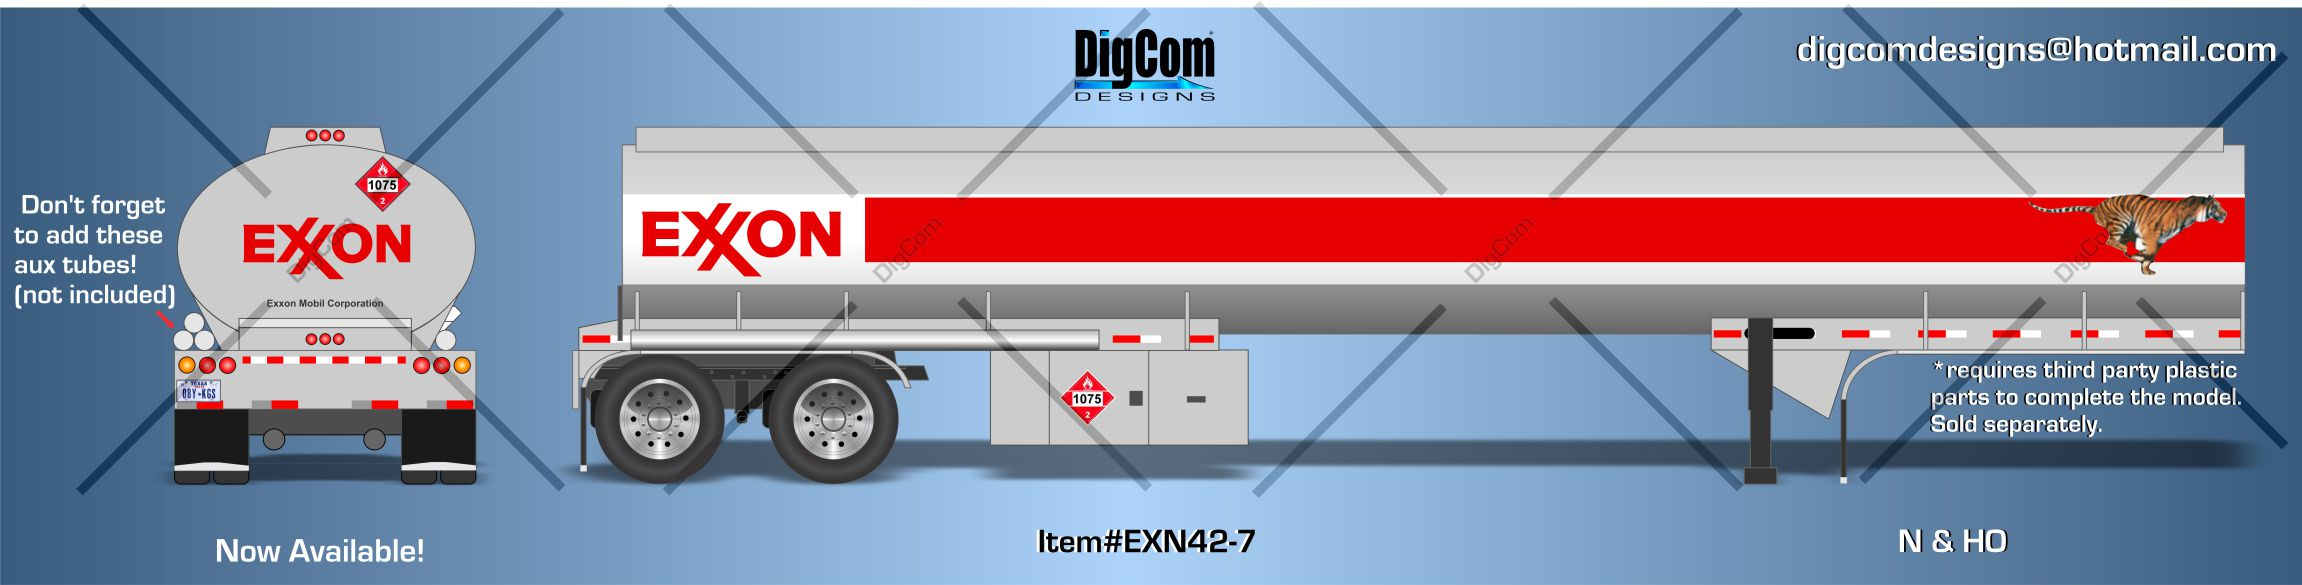 EXXON TANKER DESIGN.jpg